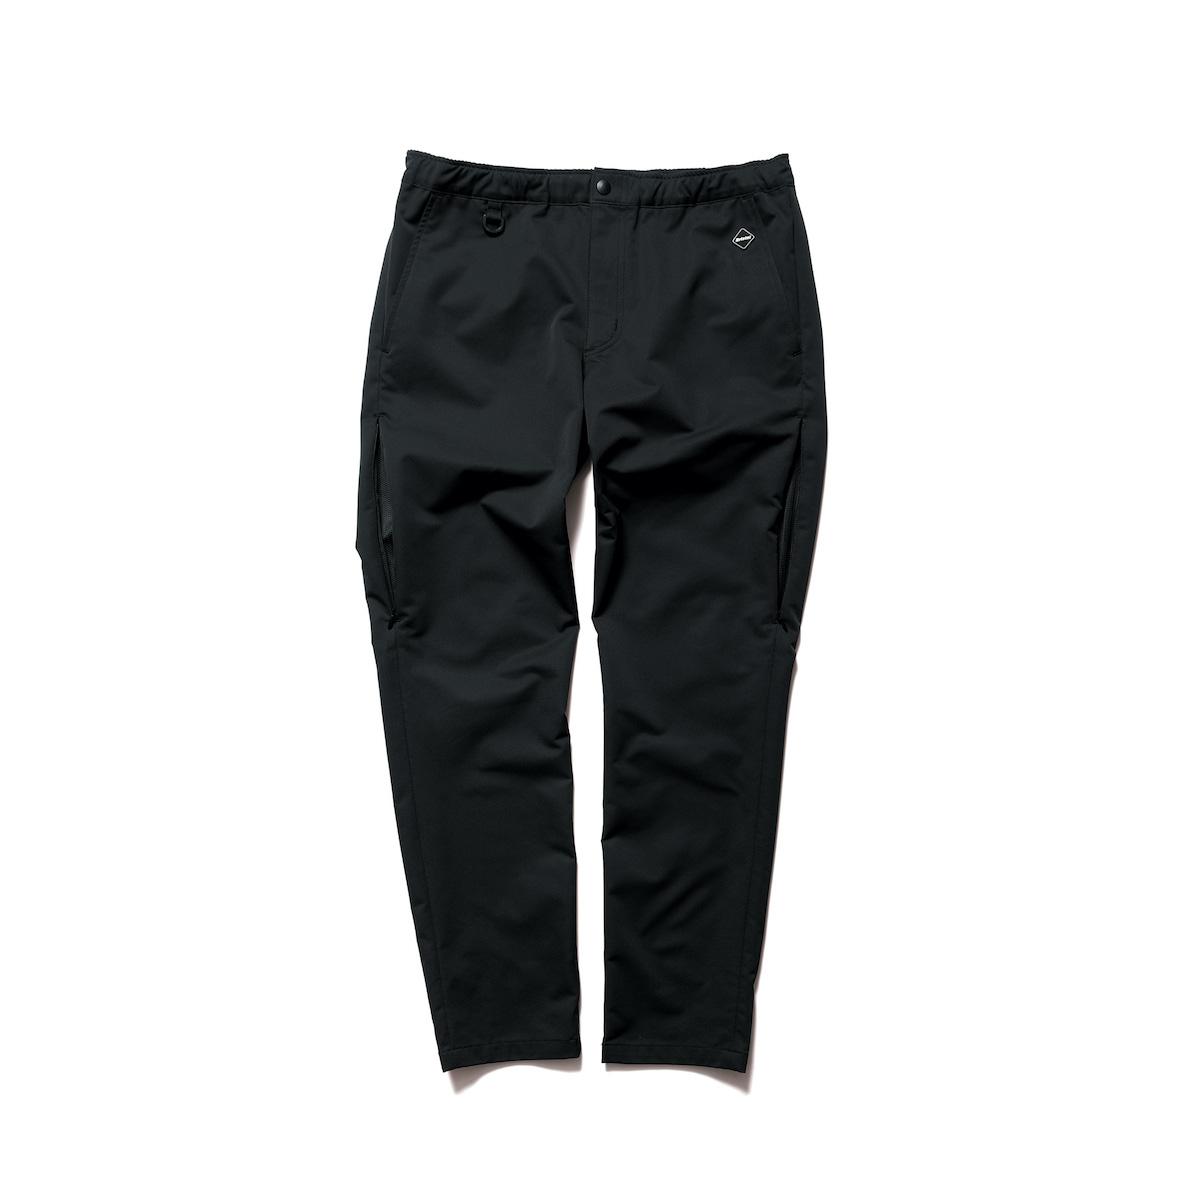 F.C.Real Bristol / VENTILATION CHINO PANTS (Black)正面